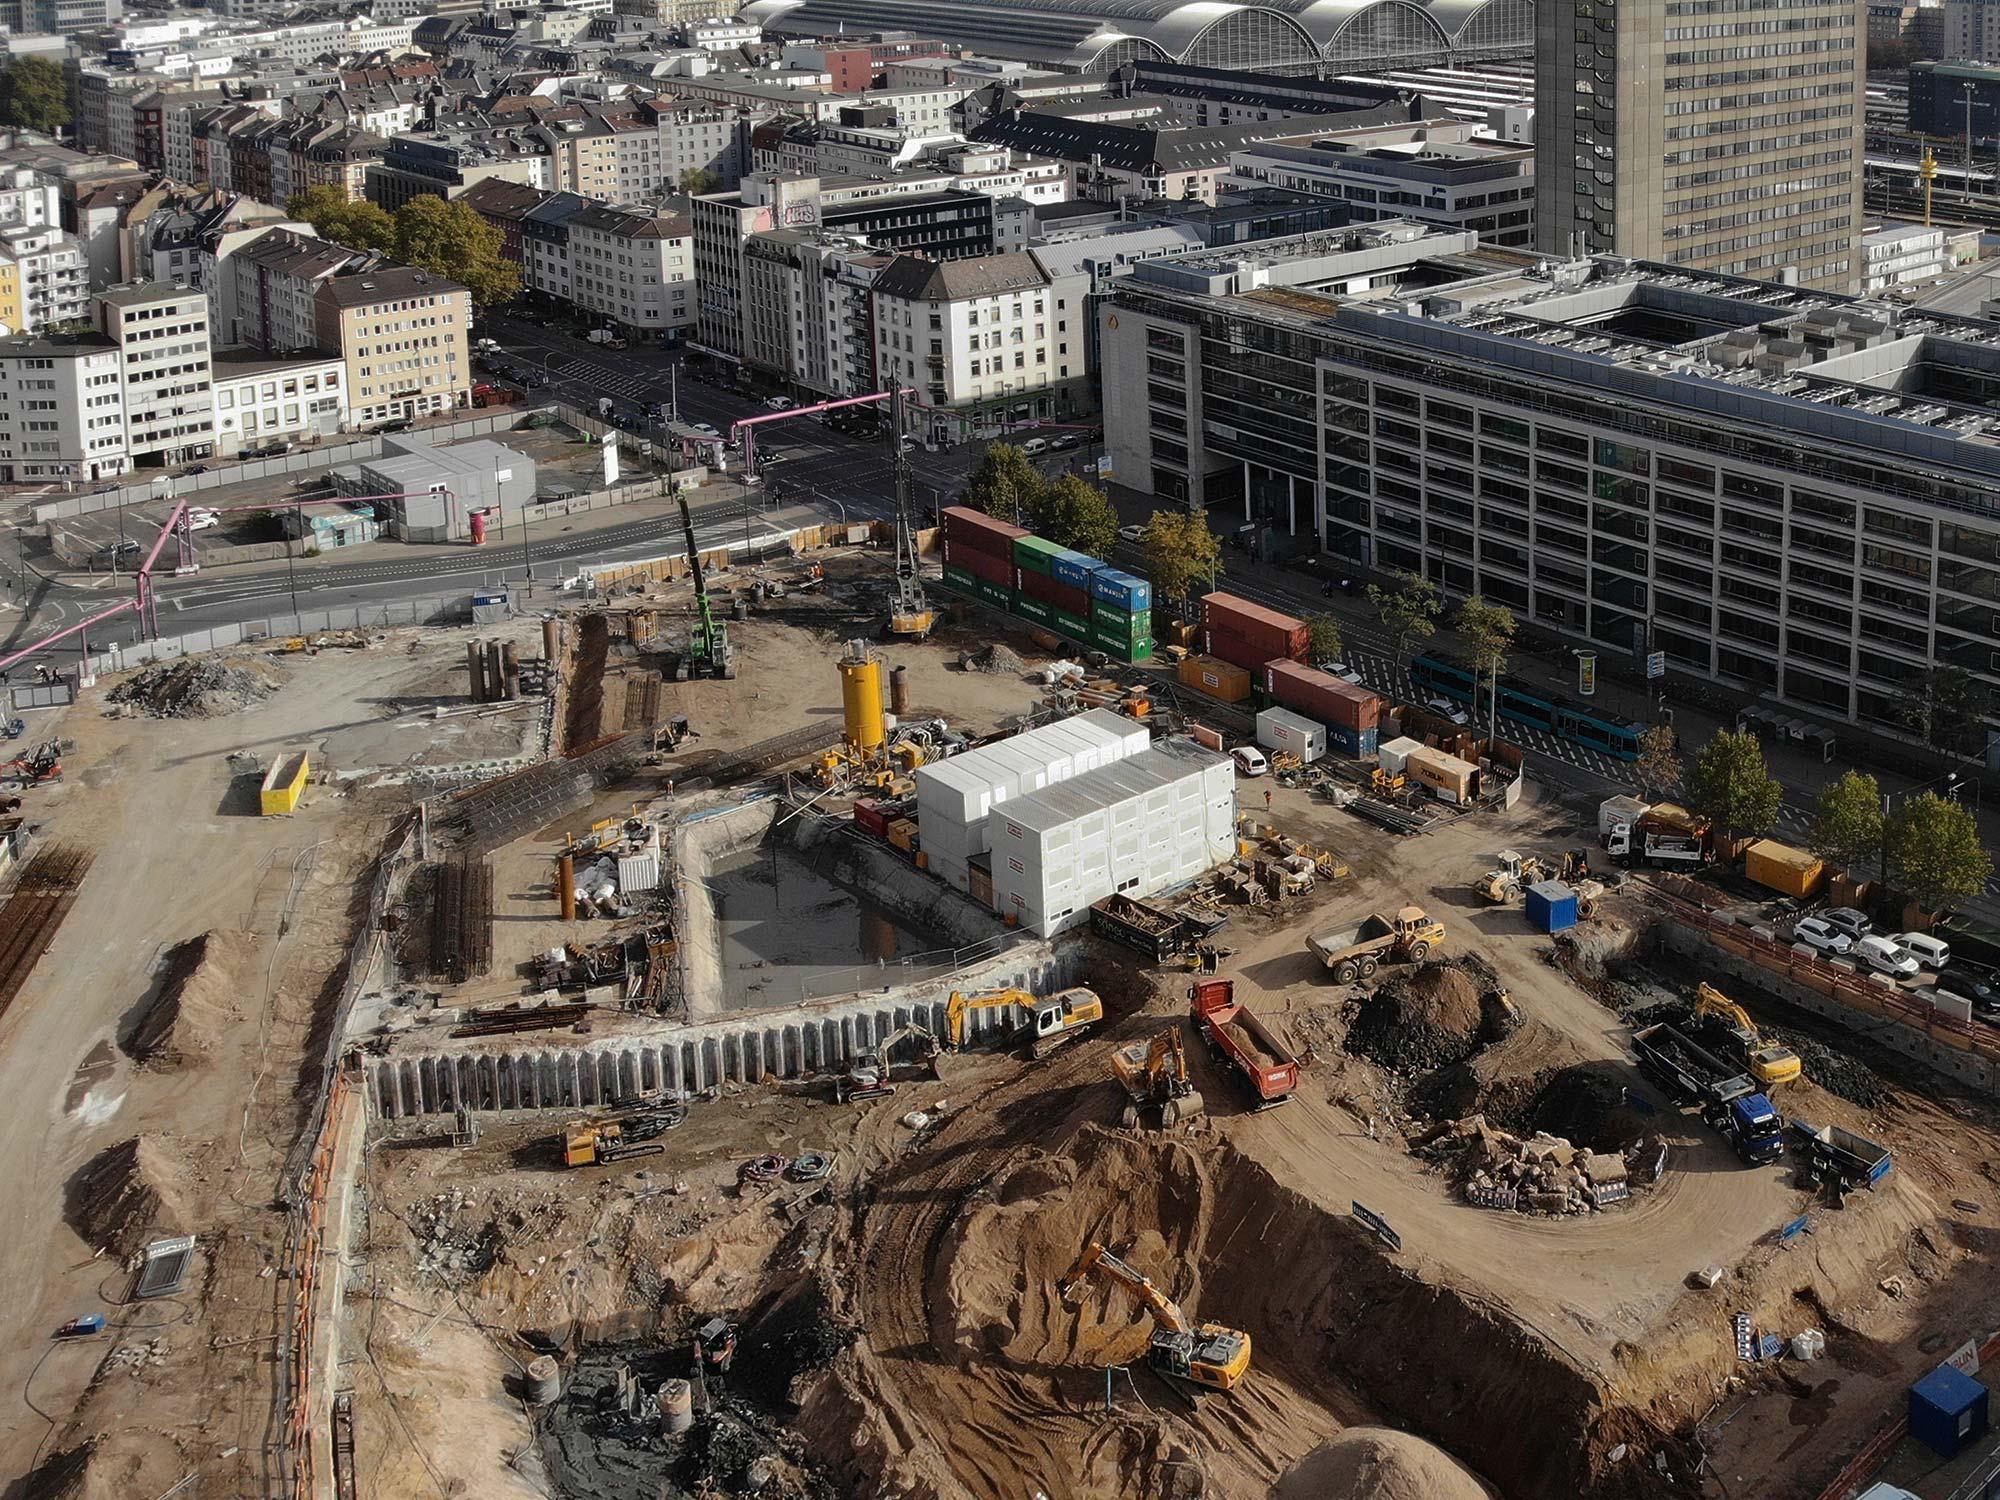 Baulogistik Anbieter Frankfurt - GP Log GmbH - Groß und Partner - Baustellen-Logistik-Anbieter